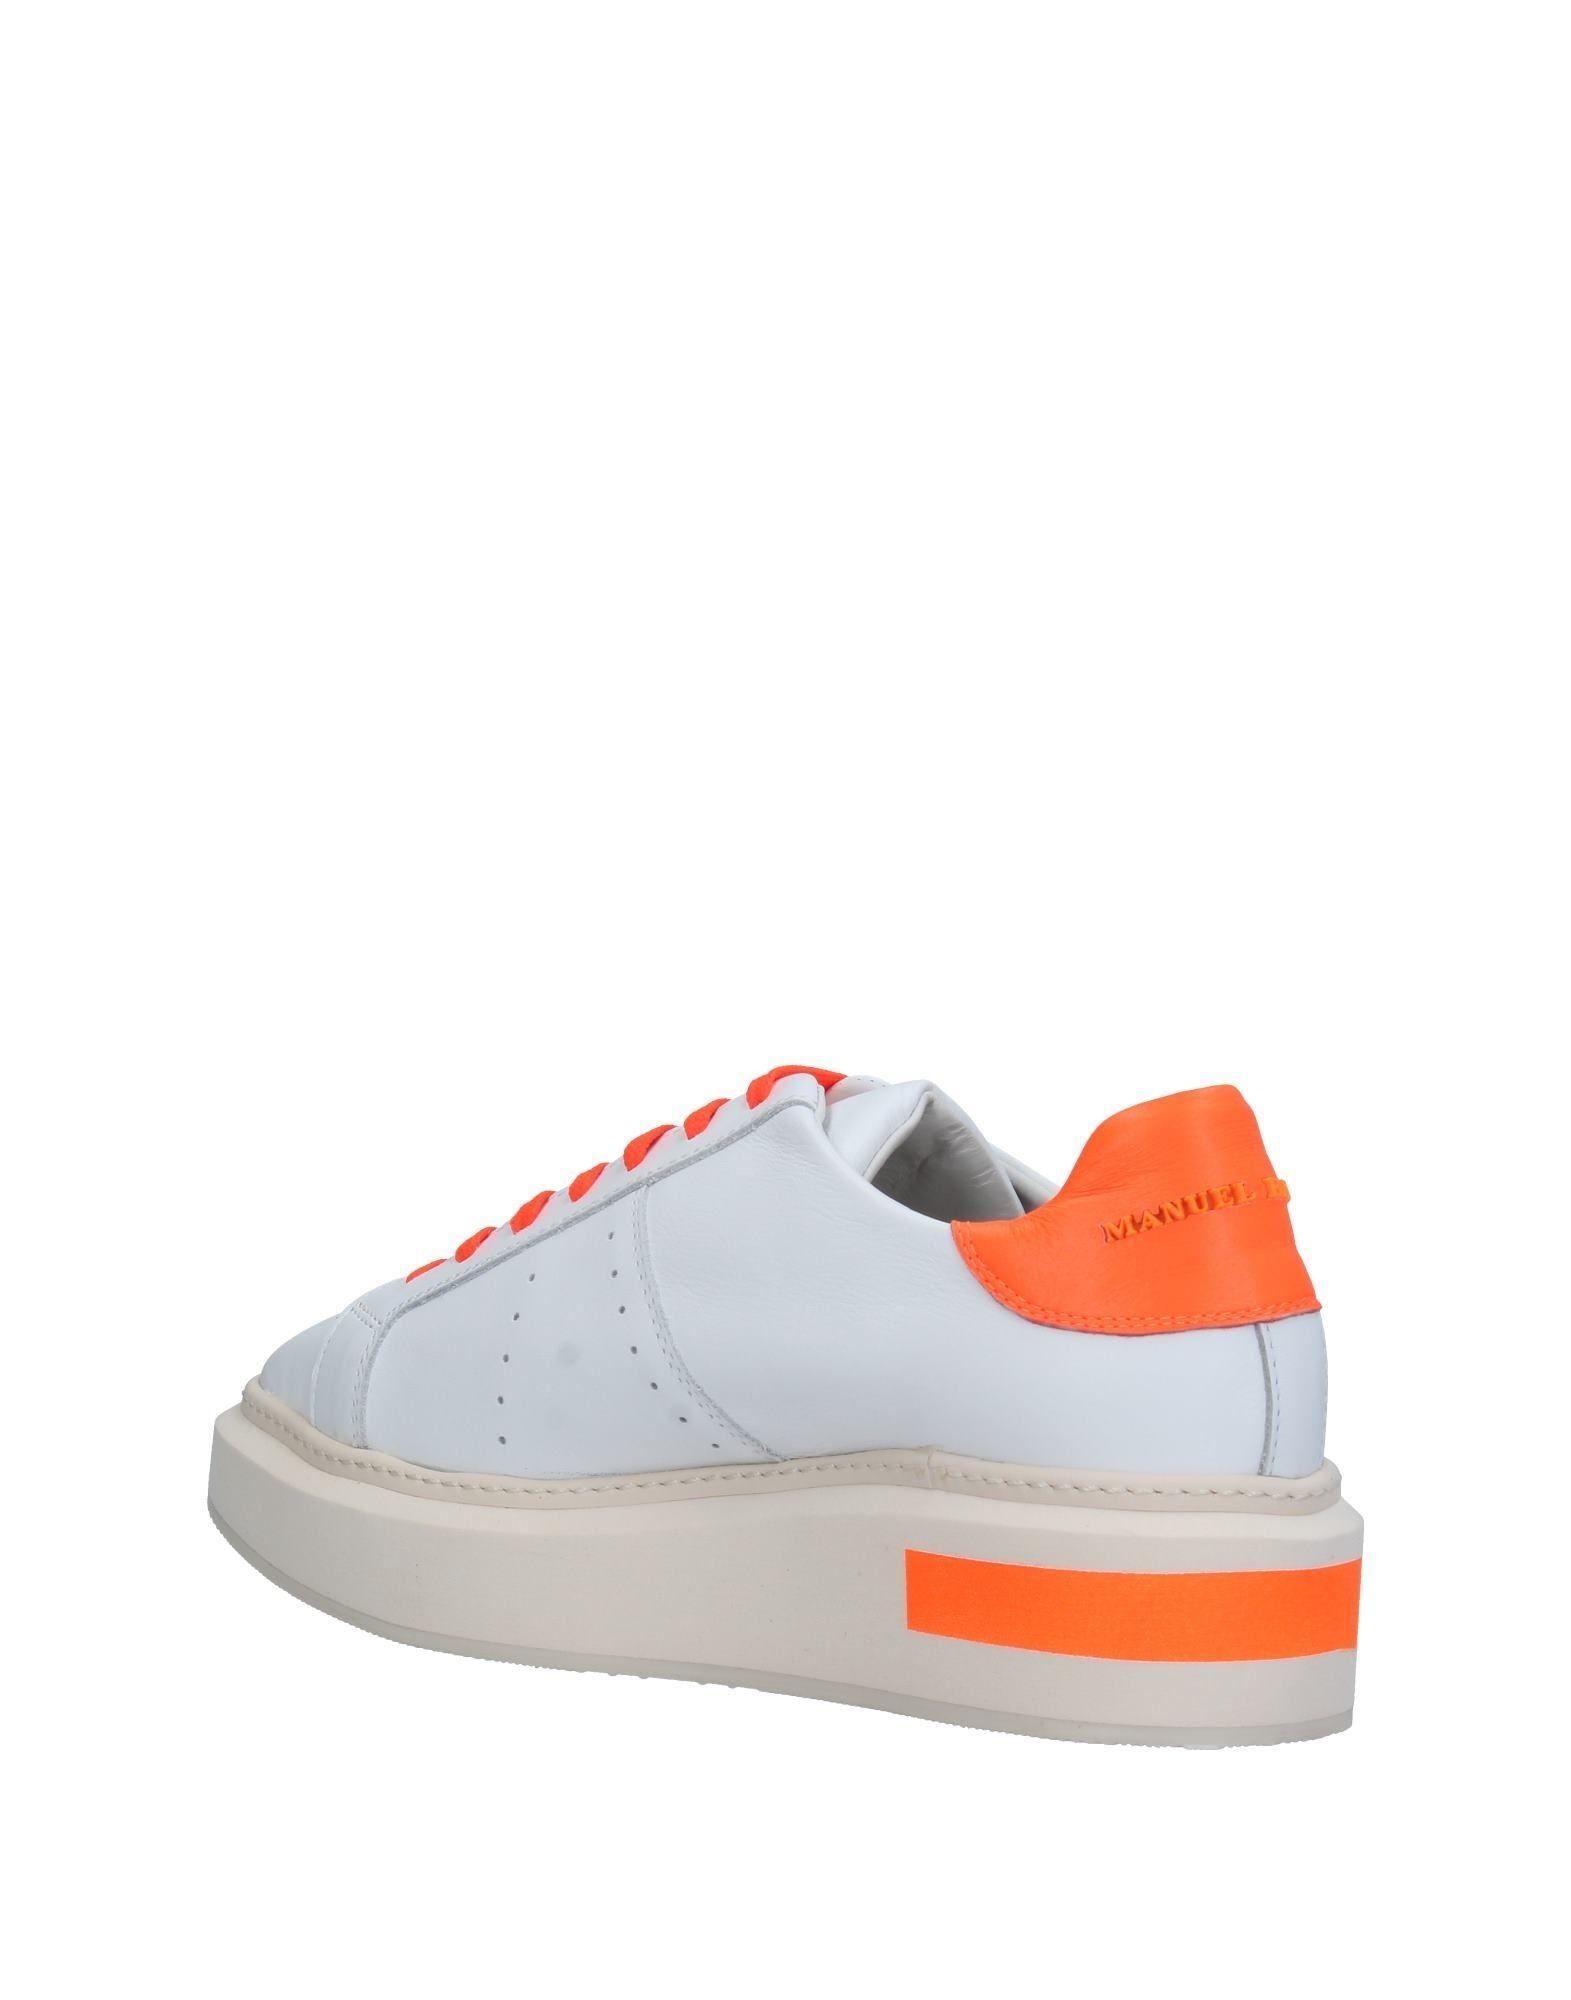 Gut um billige Schuhe Damen zu tragenManuel Barceló Turnschuhes Damen Schuhe 11332089XF f80012